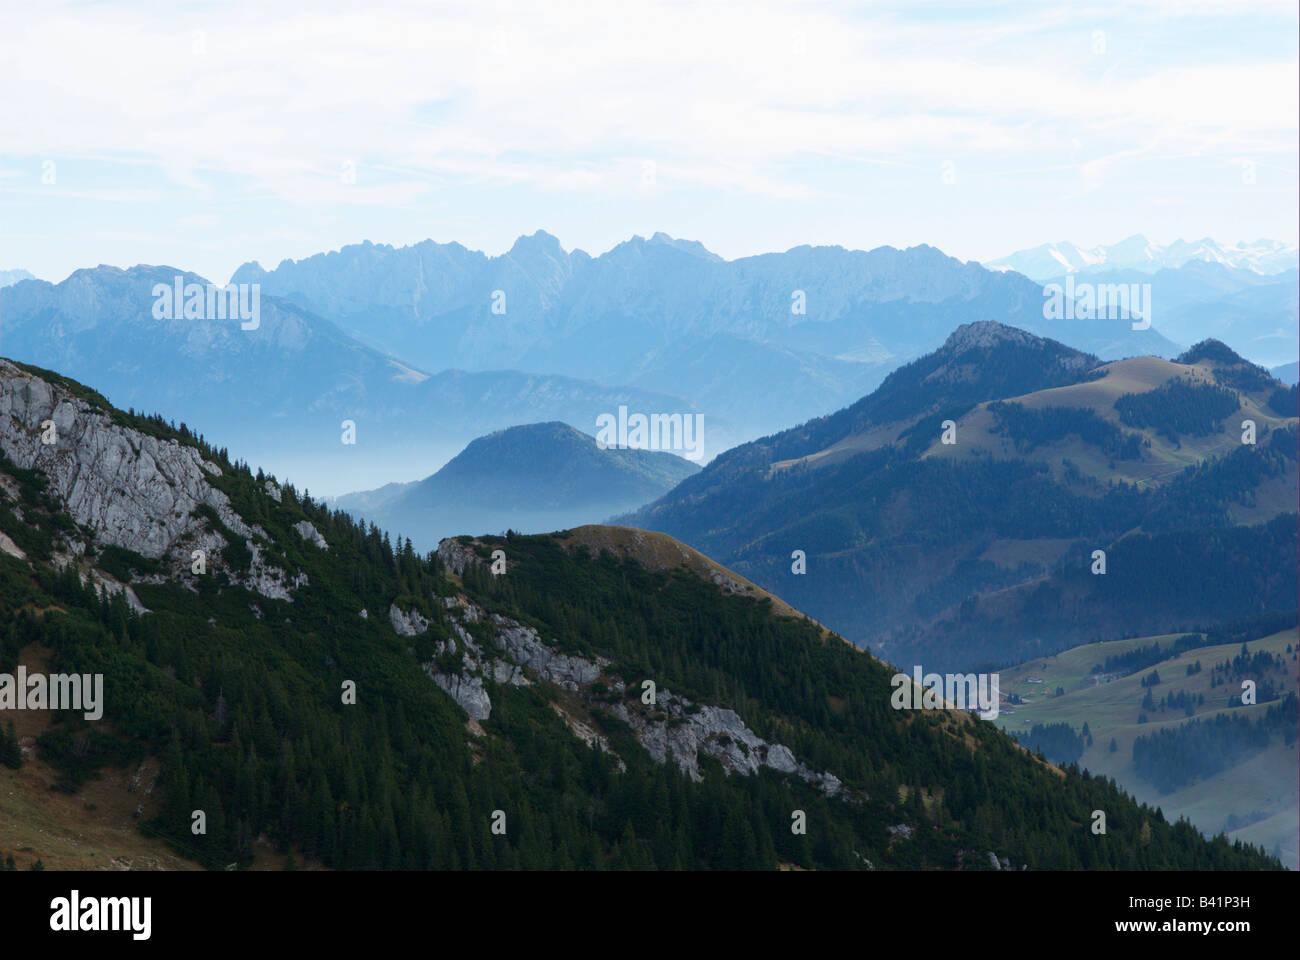 Bavarian foothills of the alps, outlook from Wendelstein, look at Karwendelgebirge - Stock Image